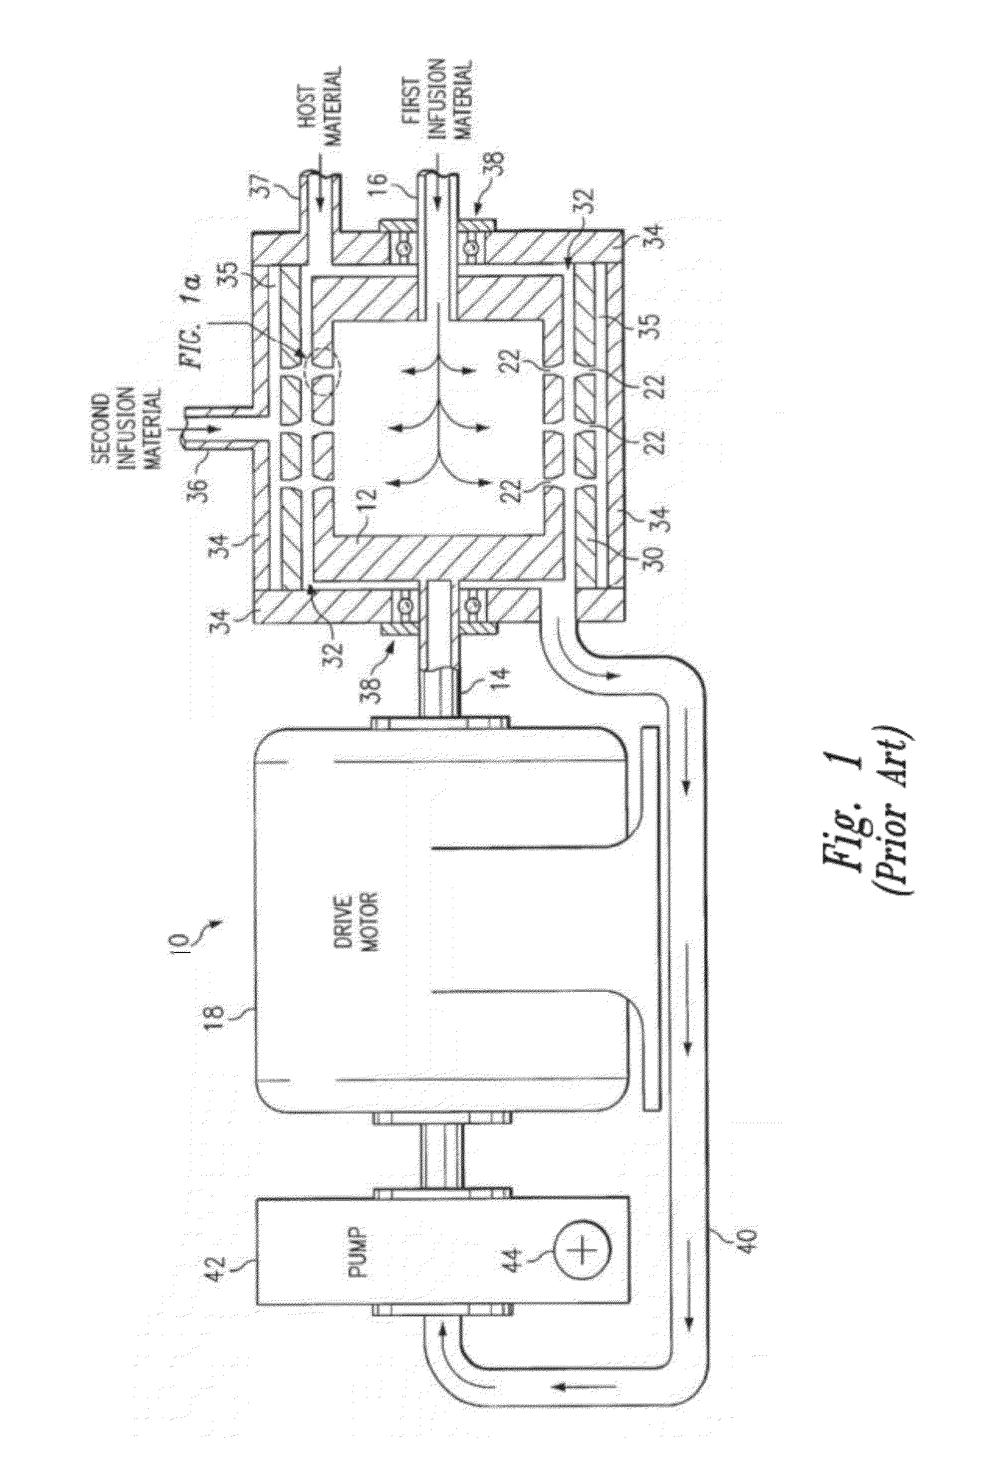 medium resolution of 05 acura rl wiring diagram best wiring library